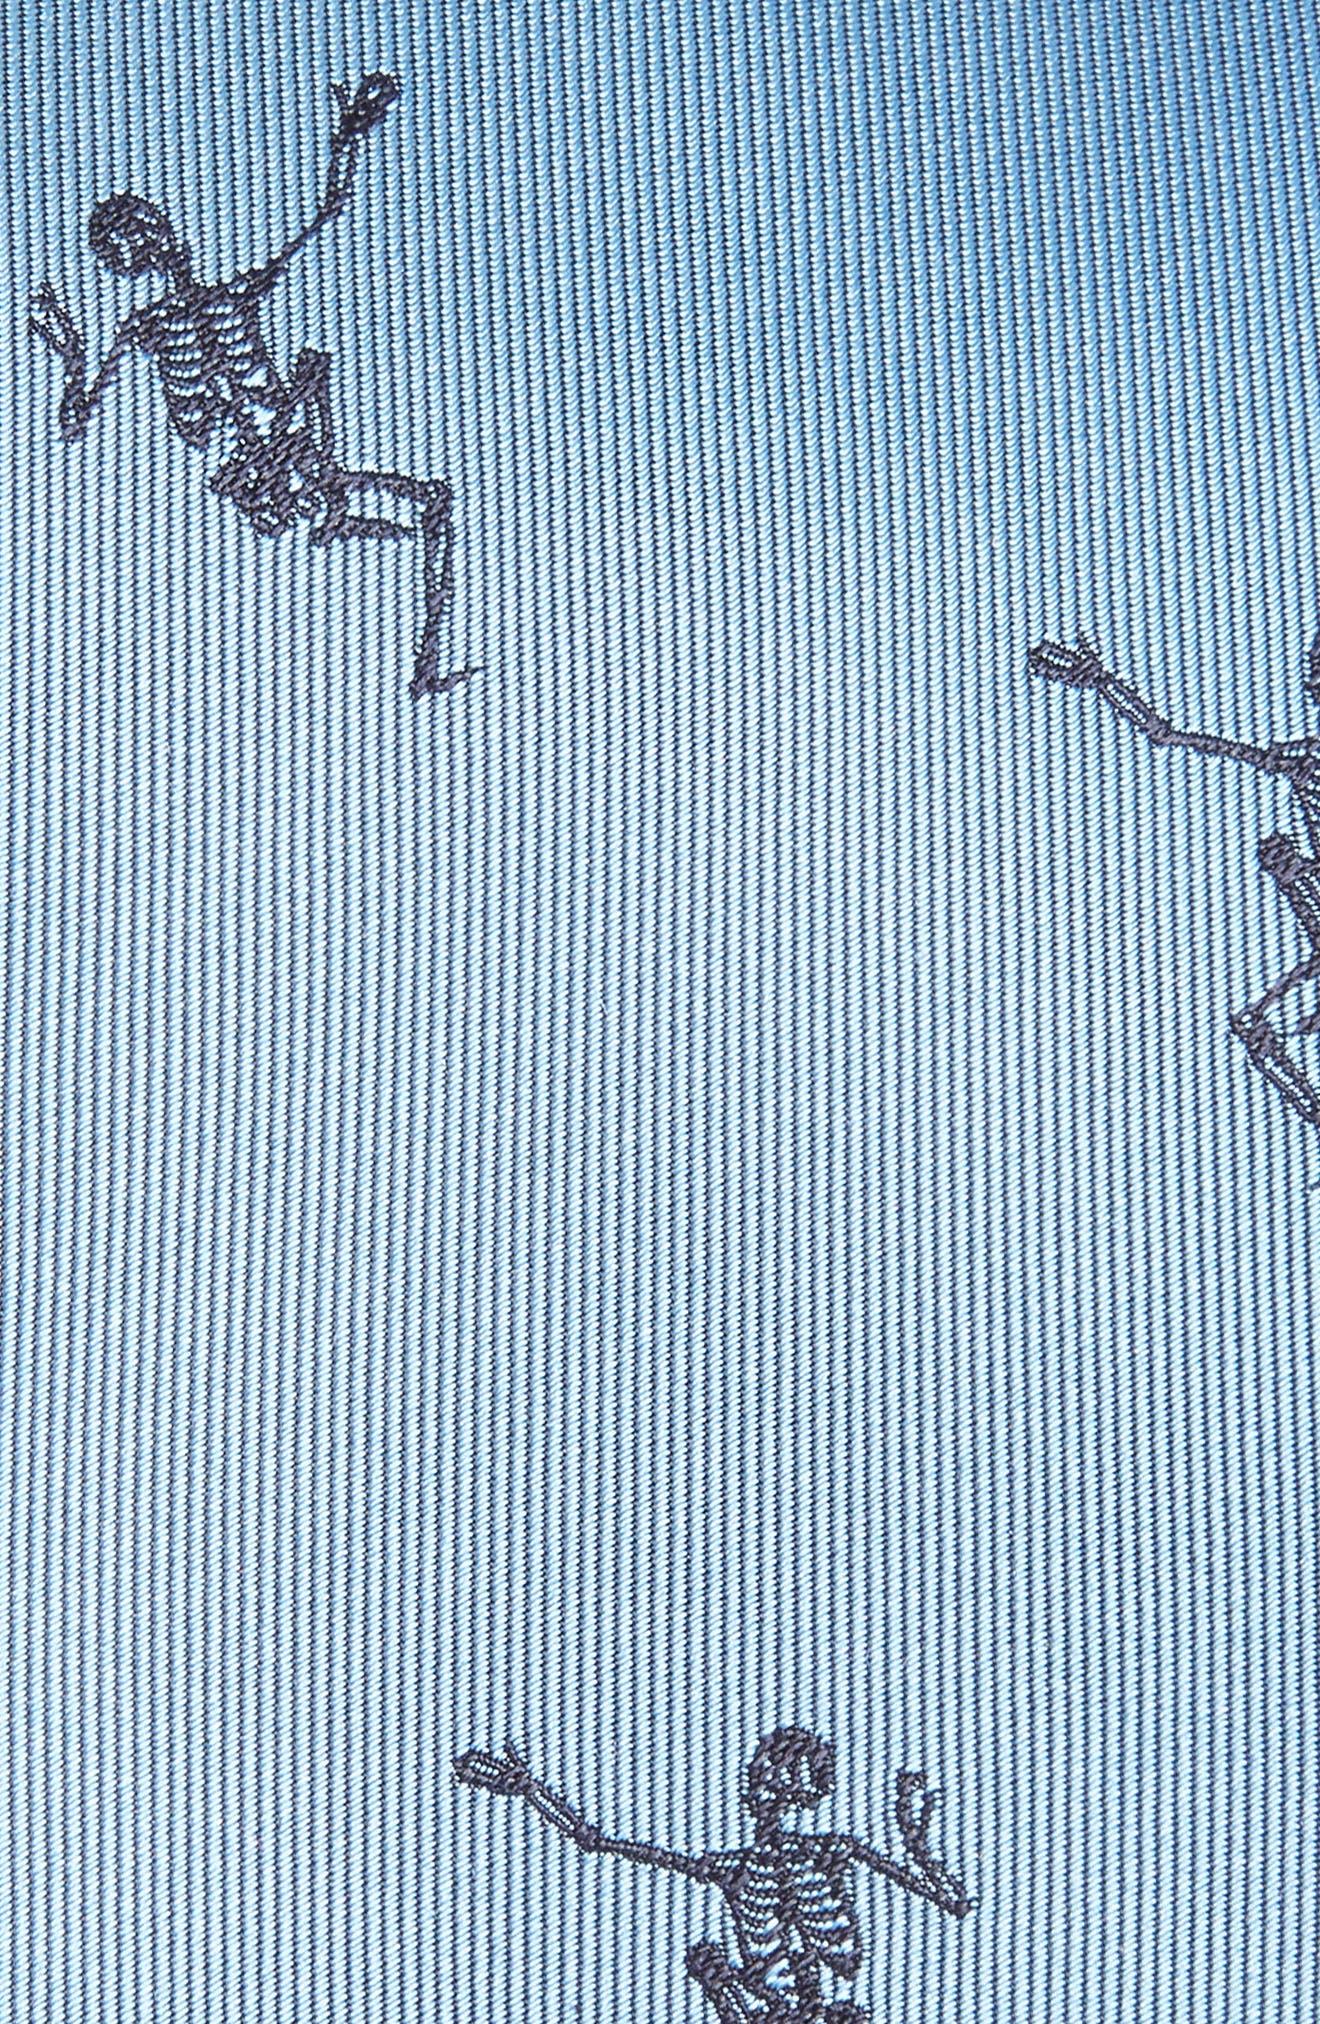 Dancing Skeleton Silk Tie,                             Alternate thumbnail 2, color,                             Sky Blue